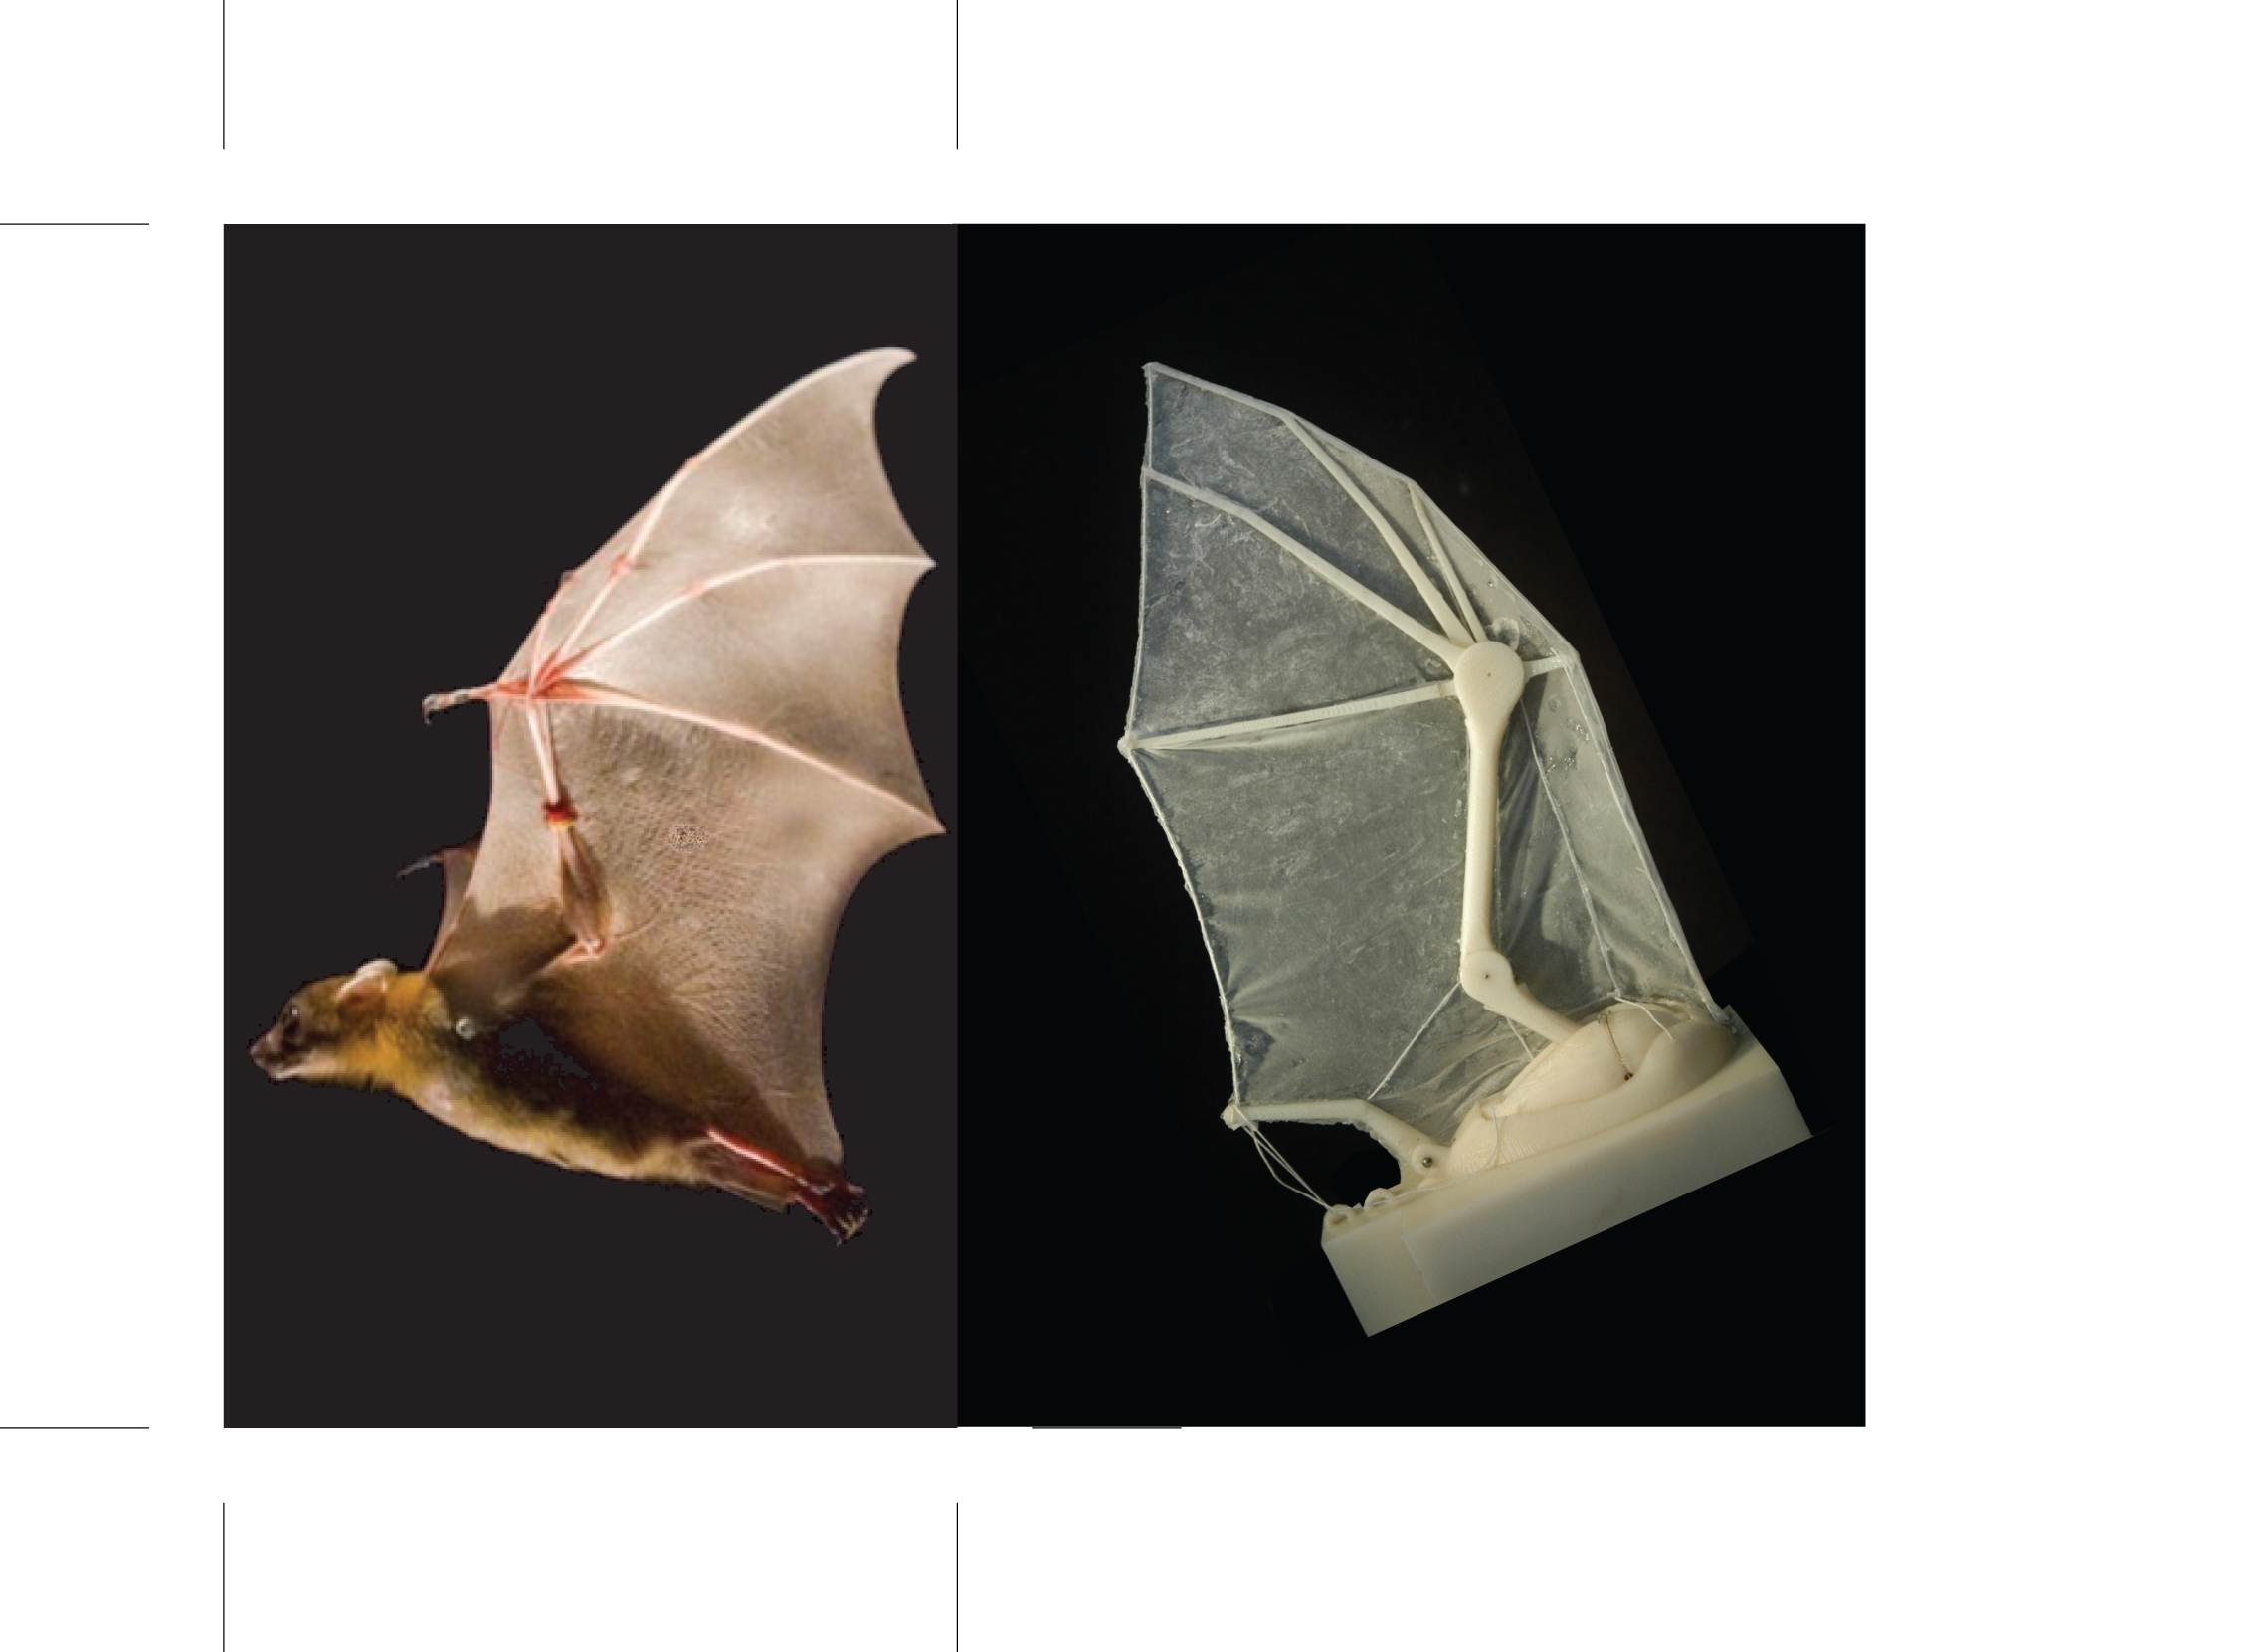 Researchers build robotic bat wing (w/ video)